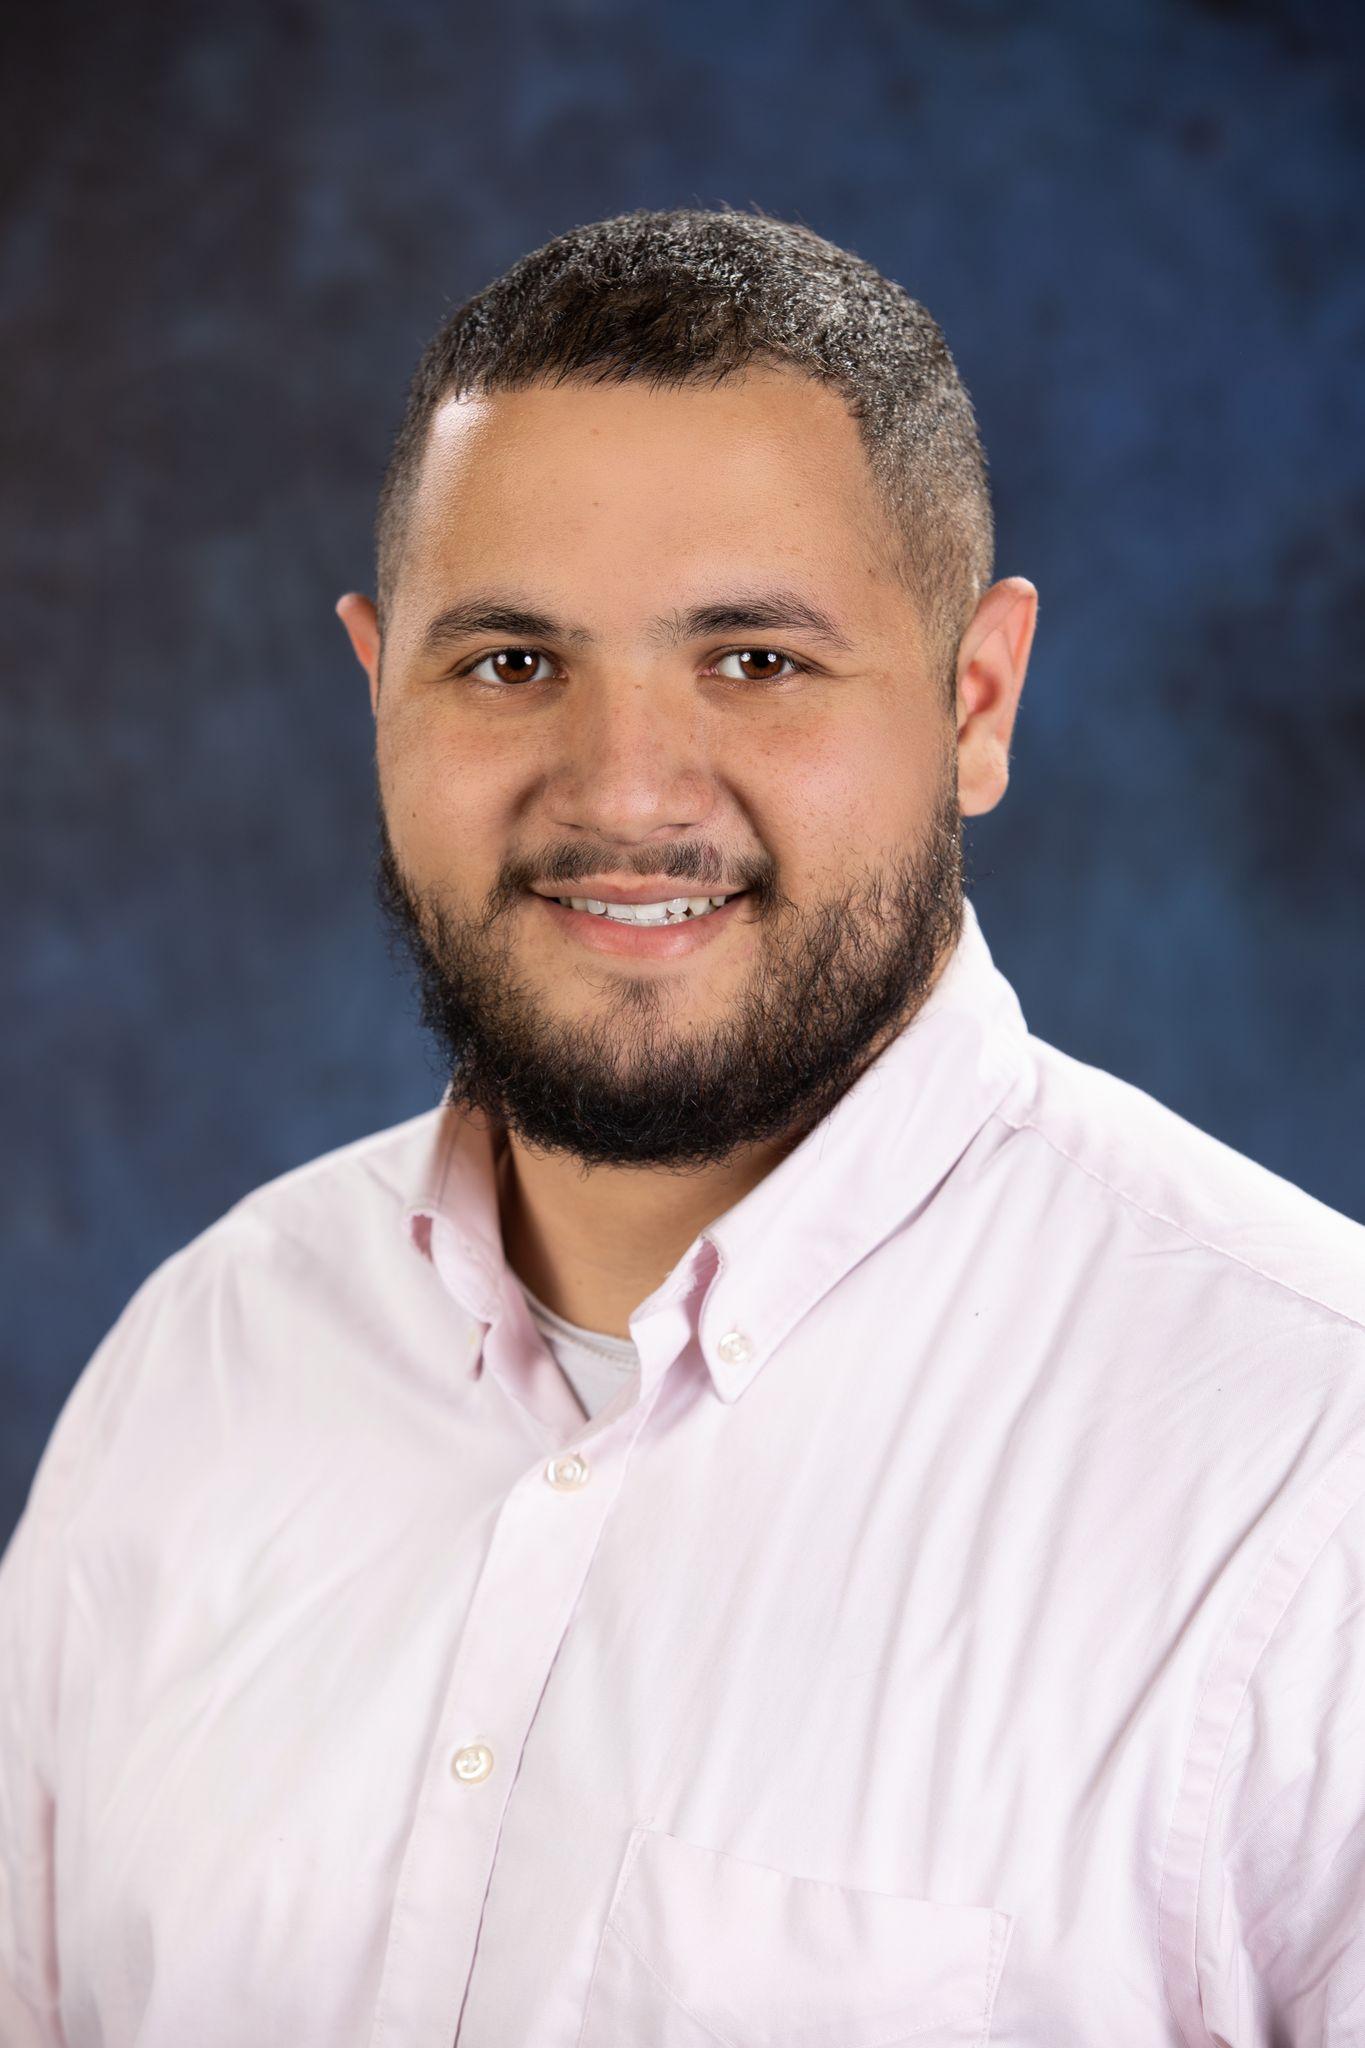 Daniel Crespo Bio Image